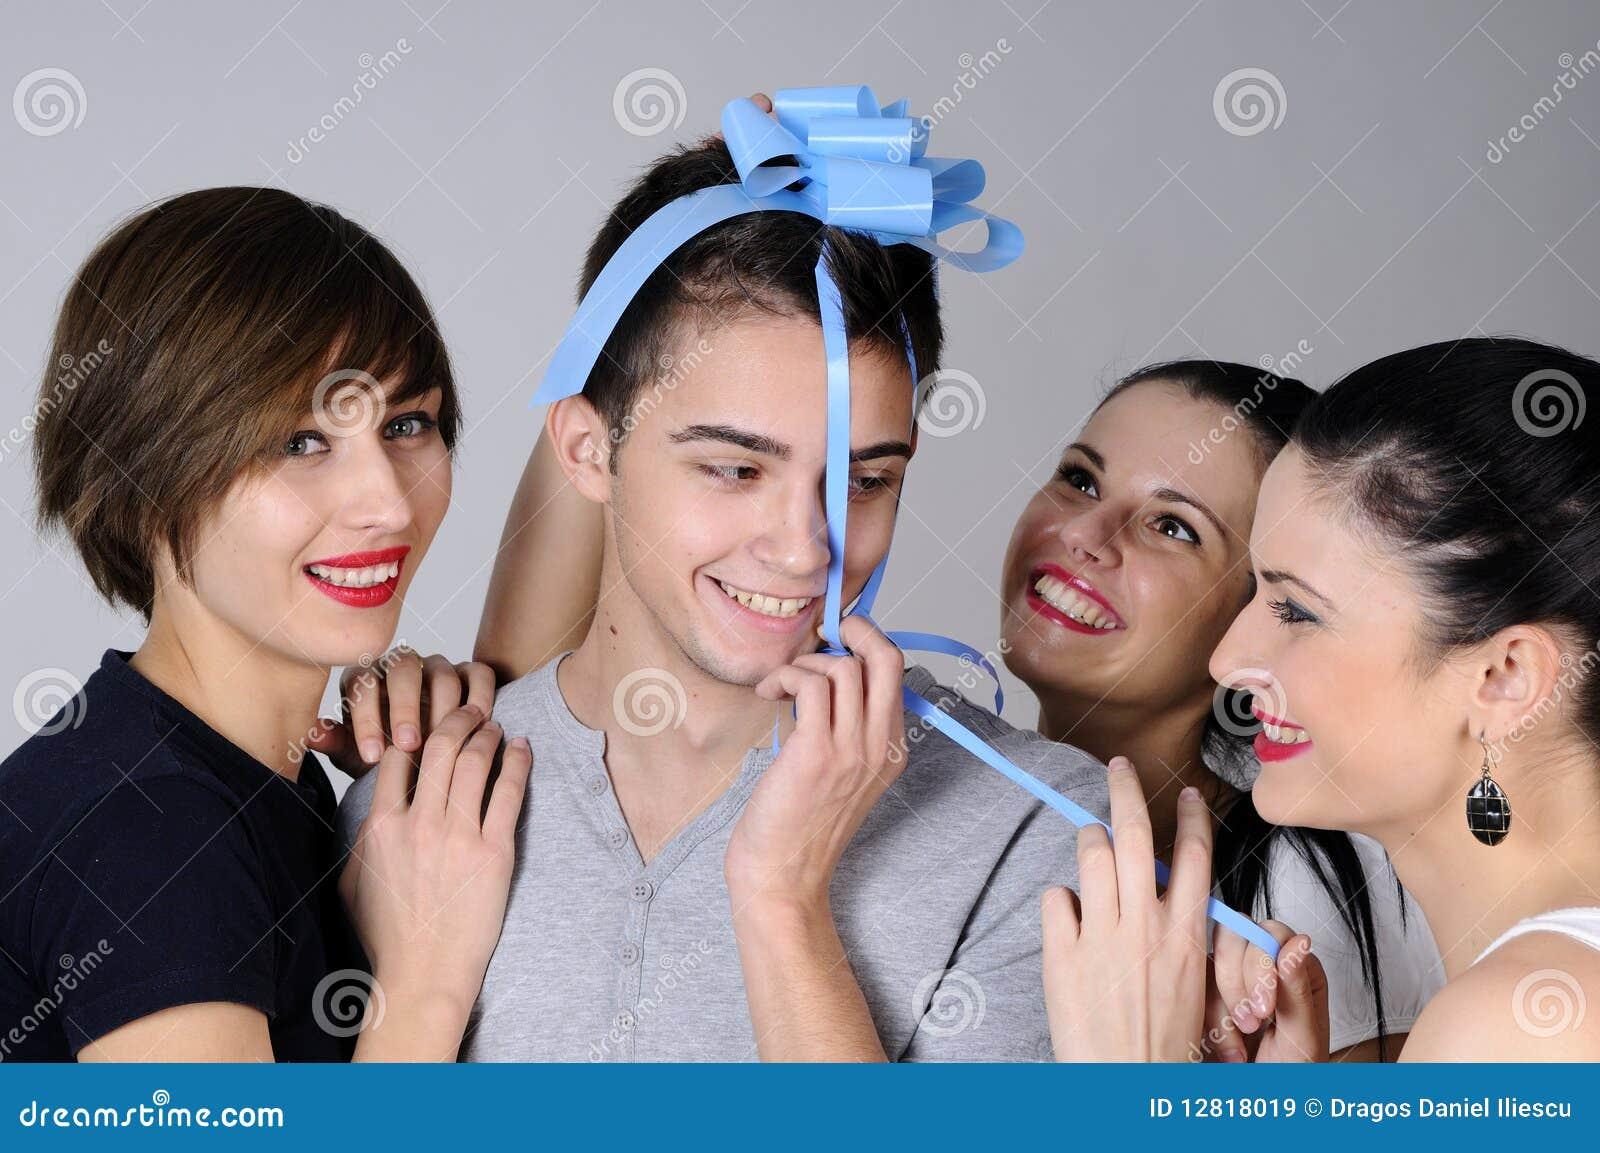 Трое девушек и парень фото фото 146-250